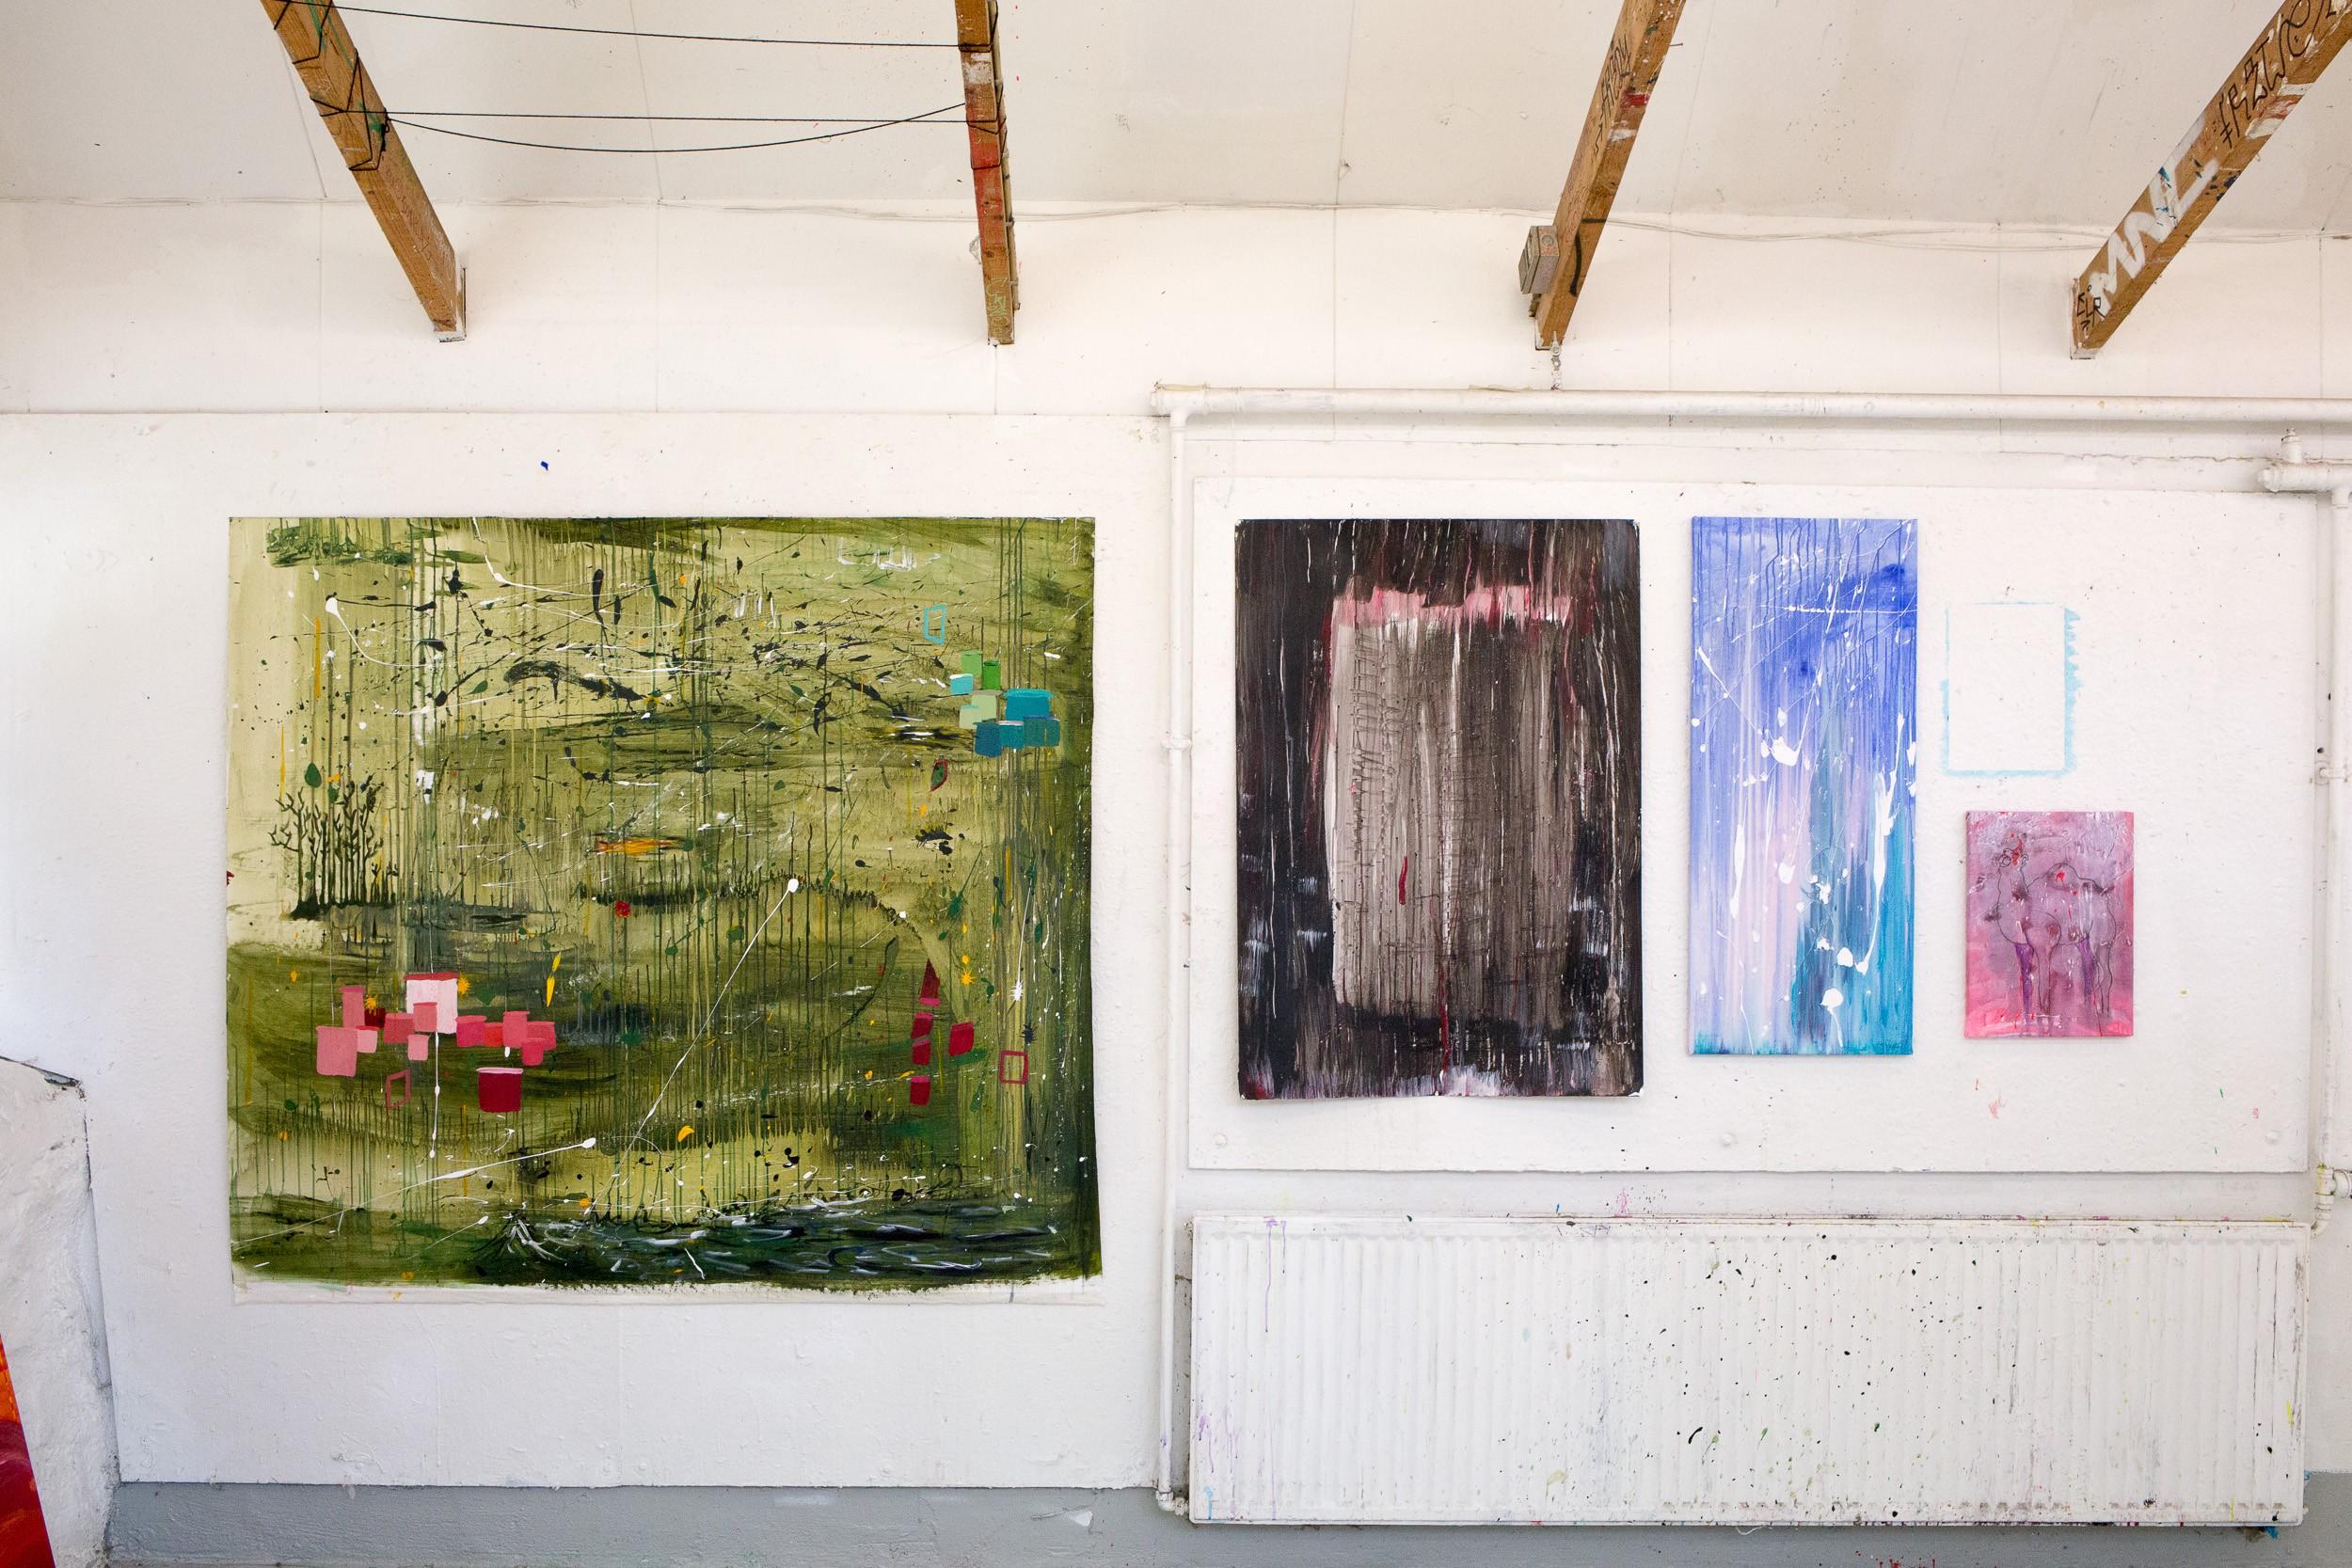 Maleri på Kunsthøjskole forår 2015